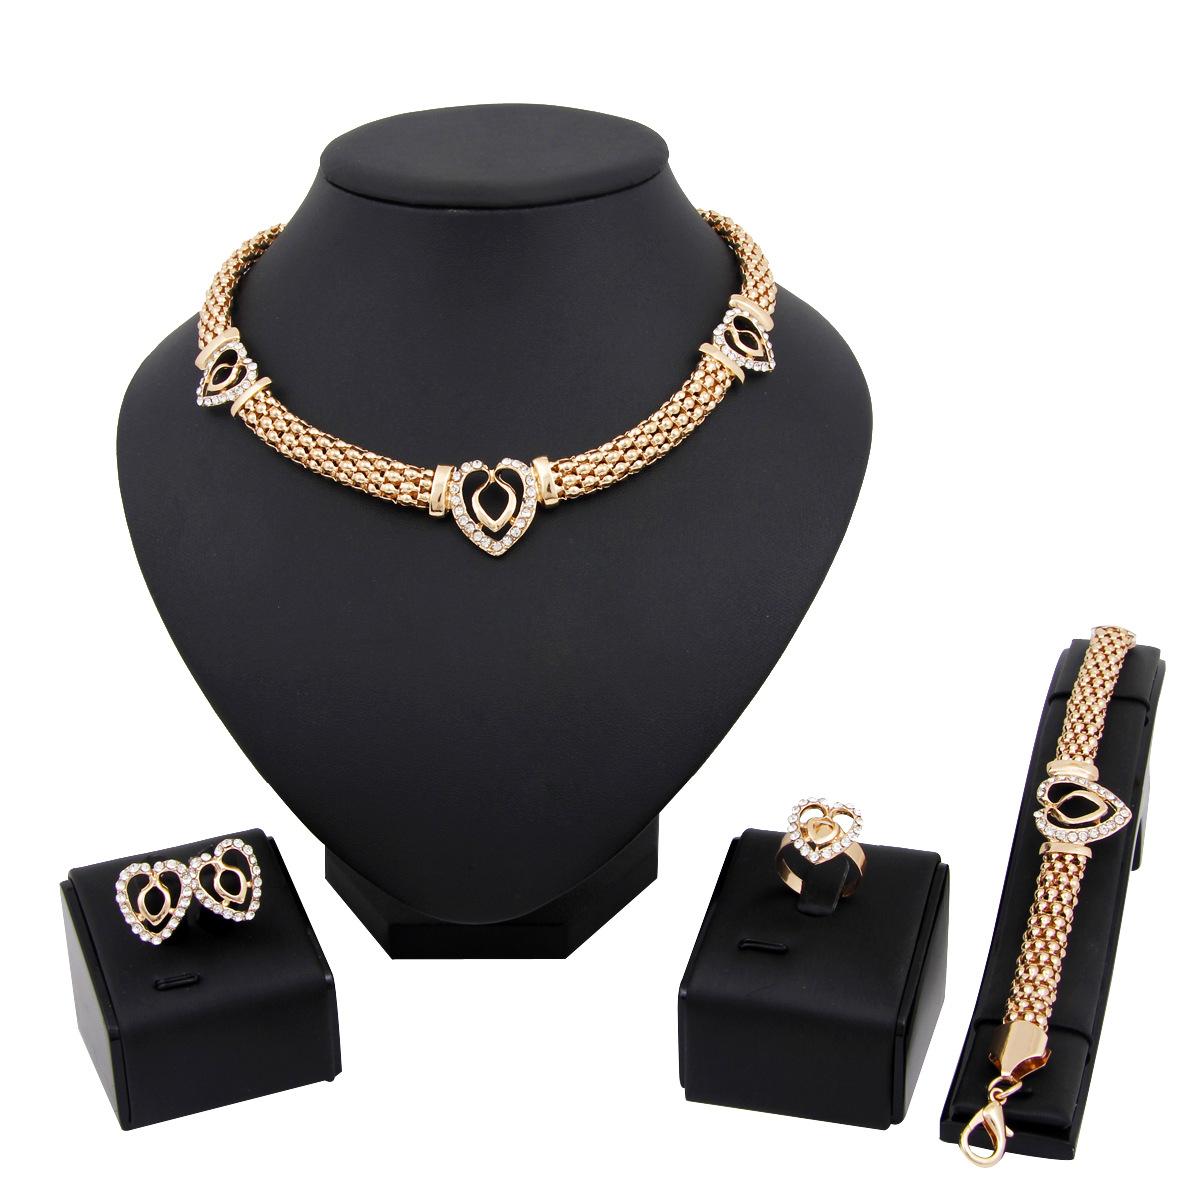 D's Keepsakes Wholesale Fashion Jewelry 29